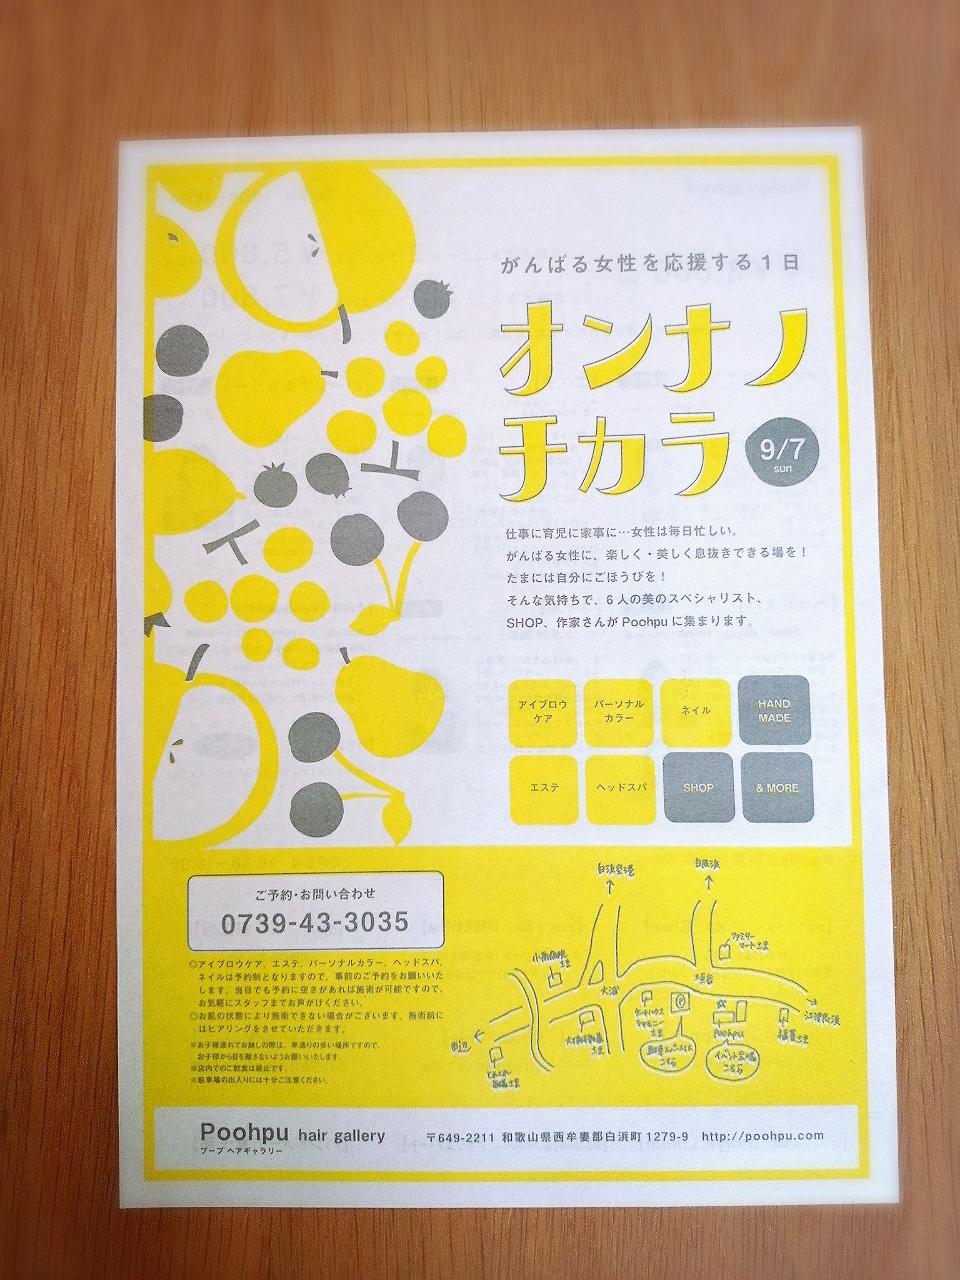 LINEcamera_share_2014-09-01-10-00-07.jpg